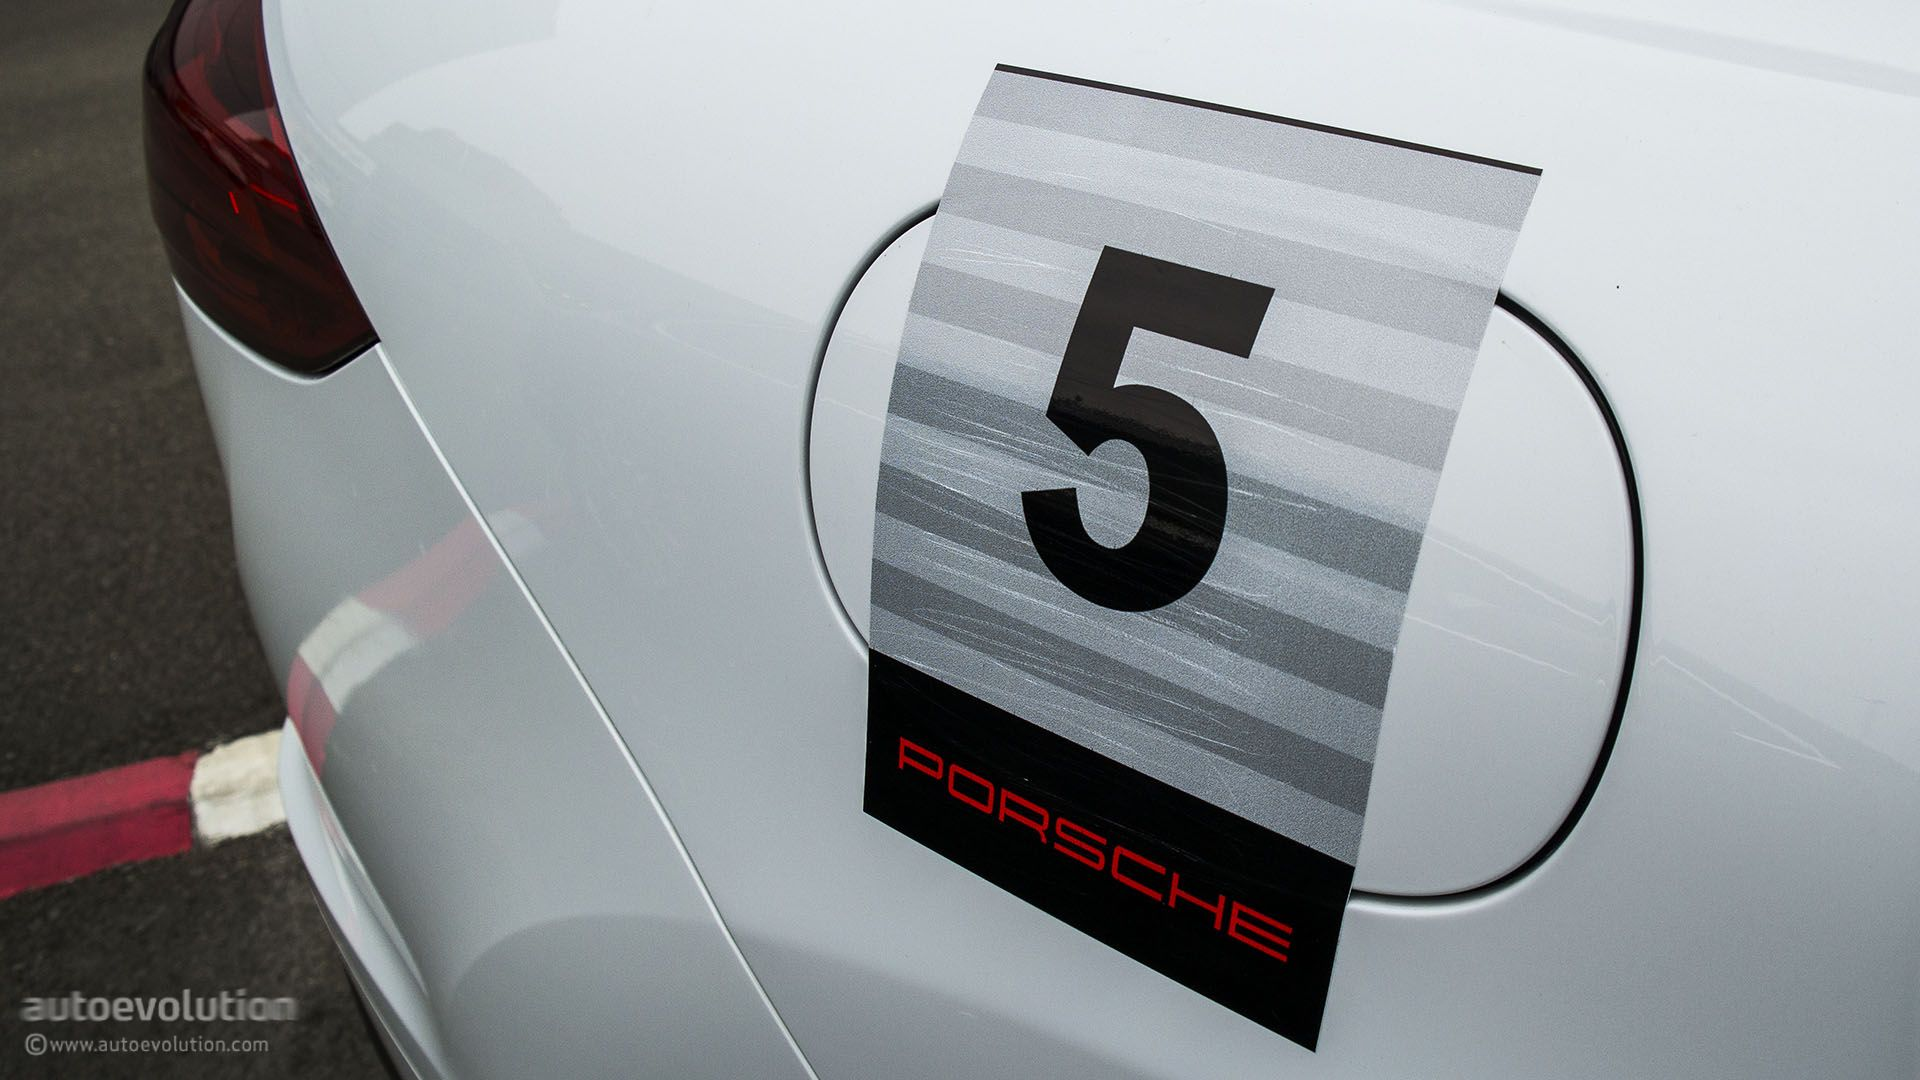 Hypermiling in a 2015 Porsche Cayenne Turbo - autoevolution